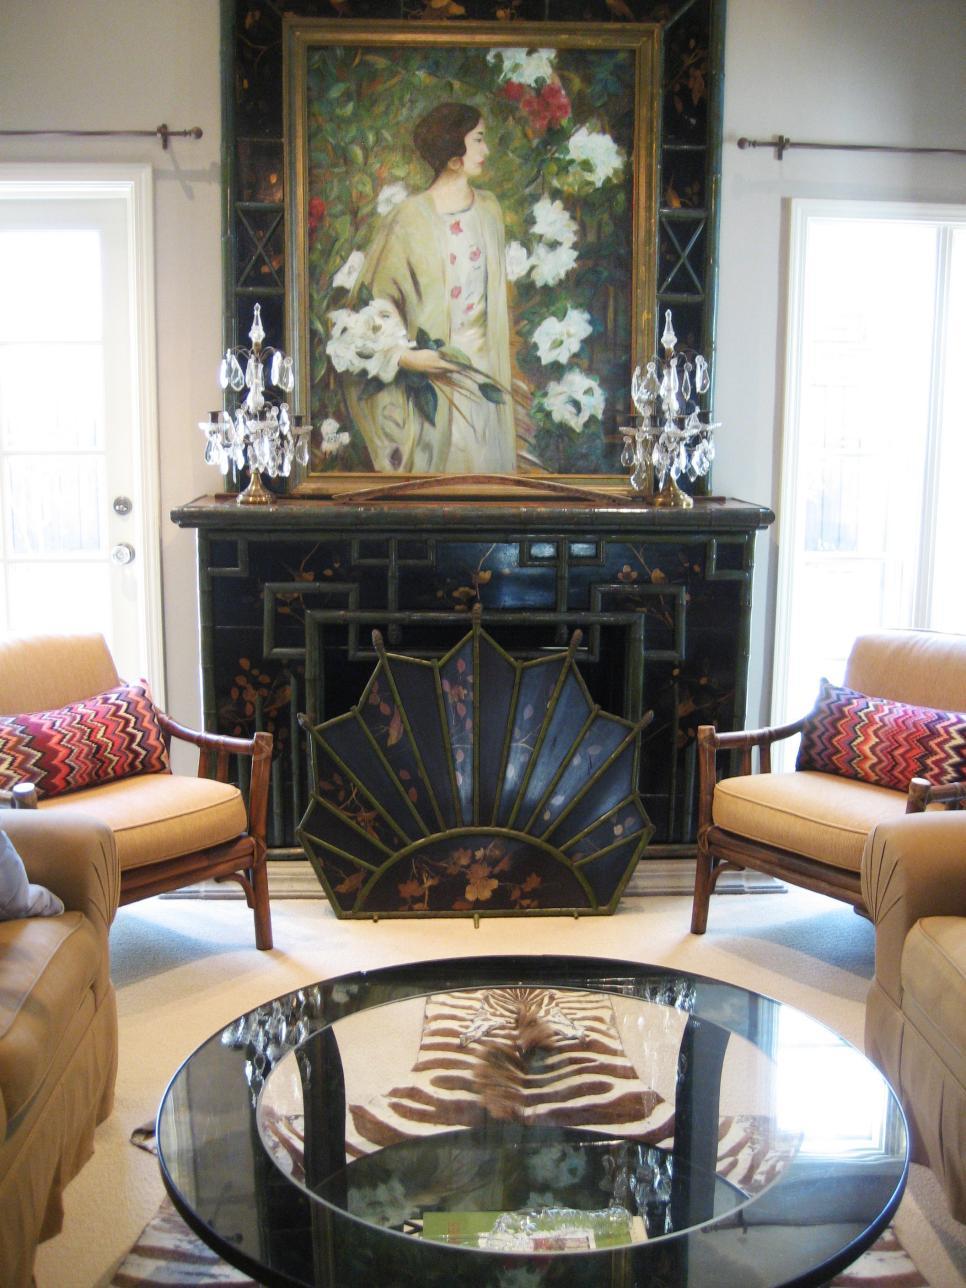 RMS_ladolfina-chinoiserie-living-room-fireplace-artwork